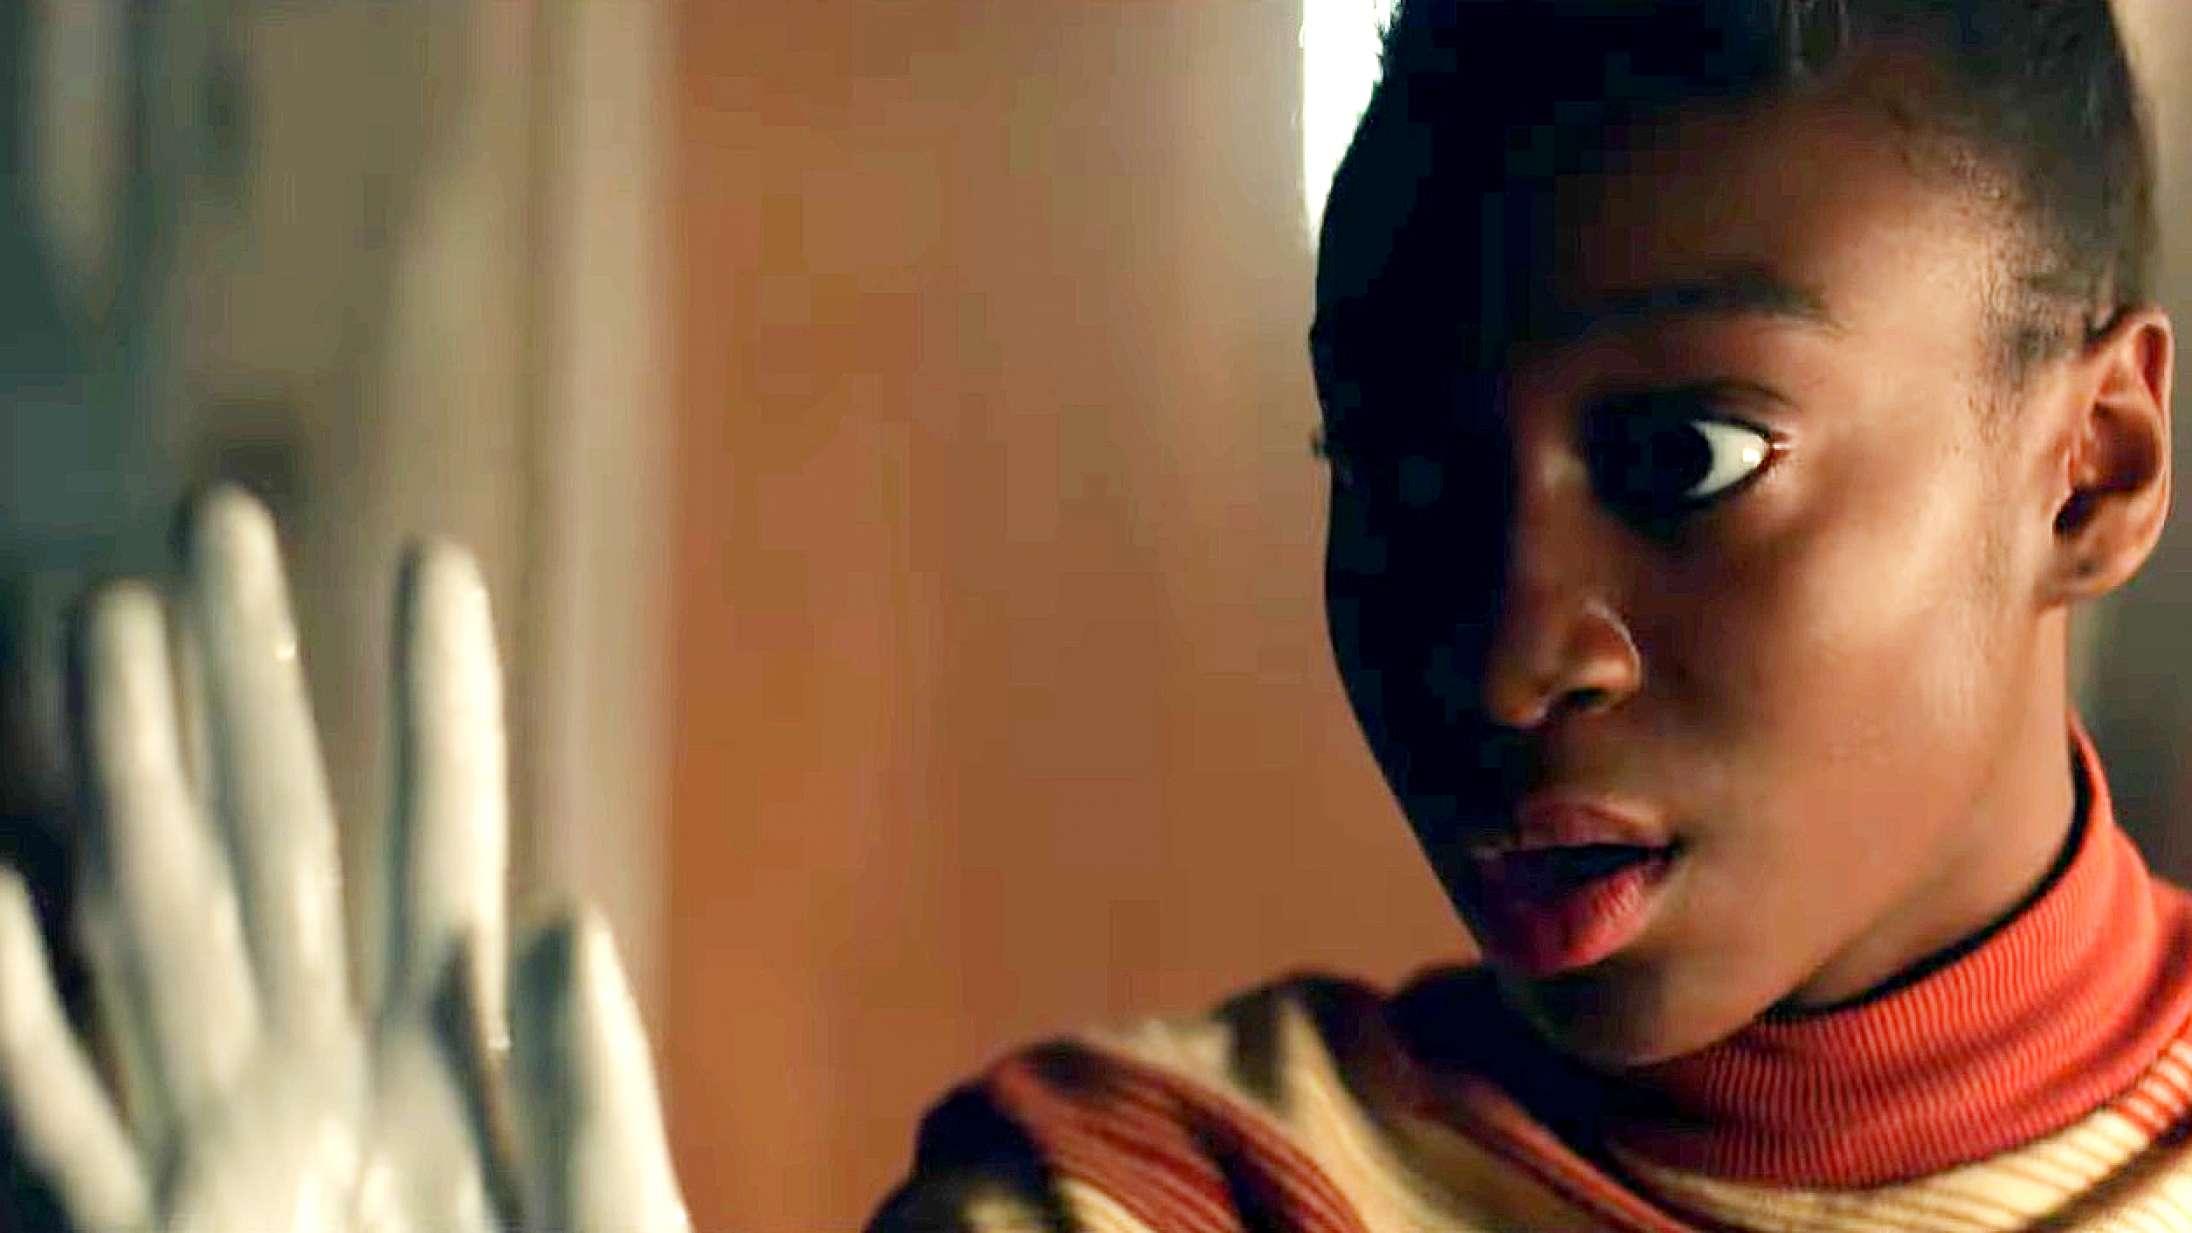 'Them': Ny gyserserie a la Jordan Peele er ond som ind i helvede